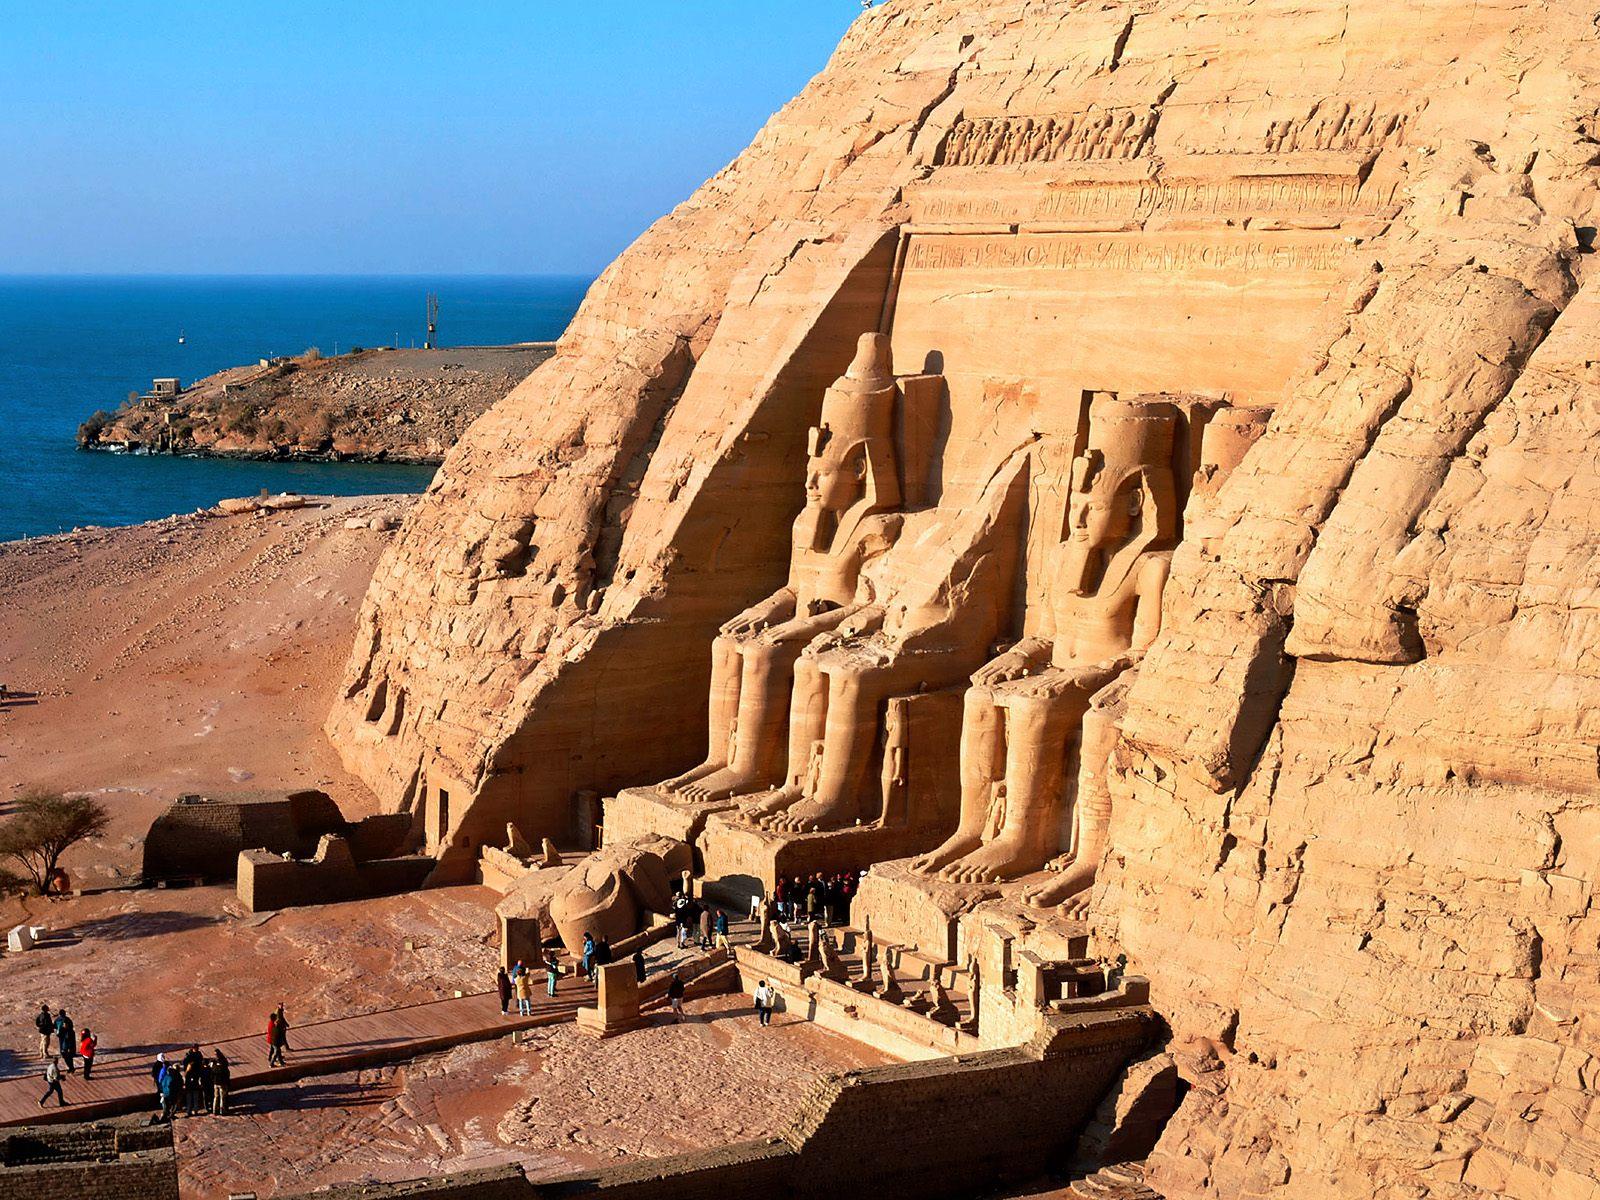 Free HQ Abu Simbel Near Aswan Egypt Wallpaper - Free HQ Wallpapers